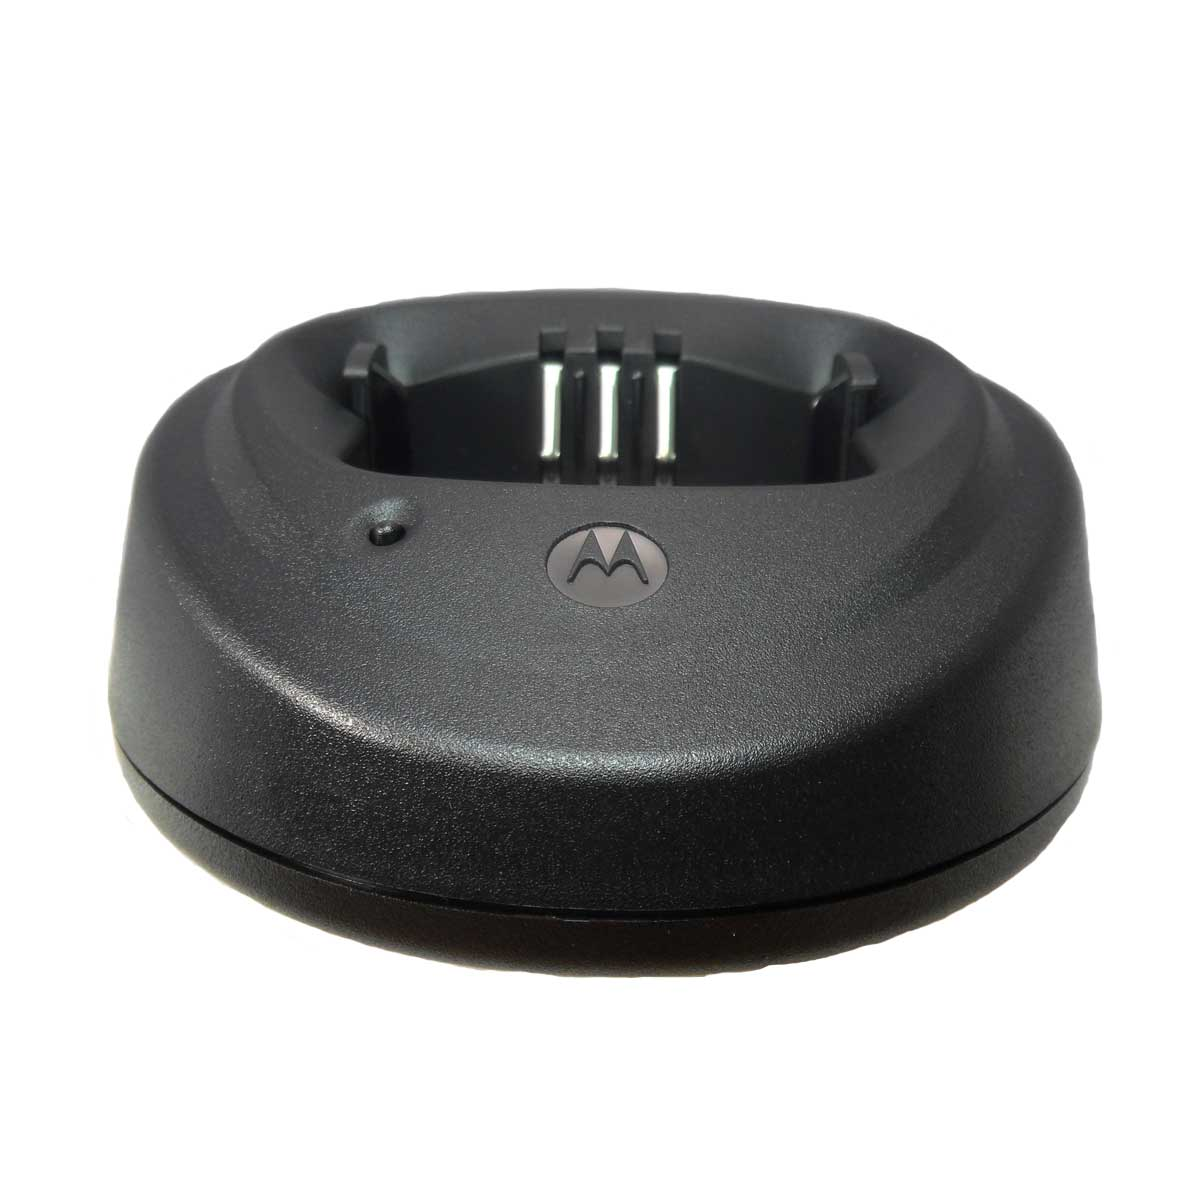 Cargador individual Motorola PMPN4173A para radio DEP450